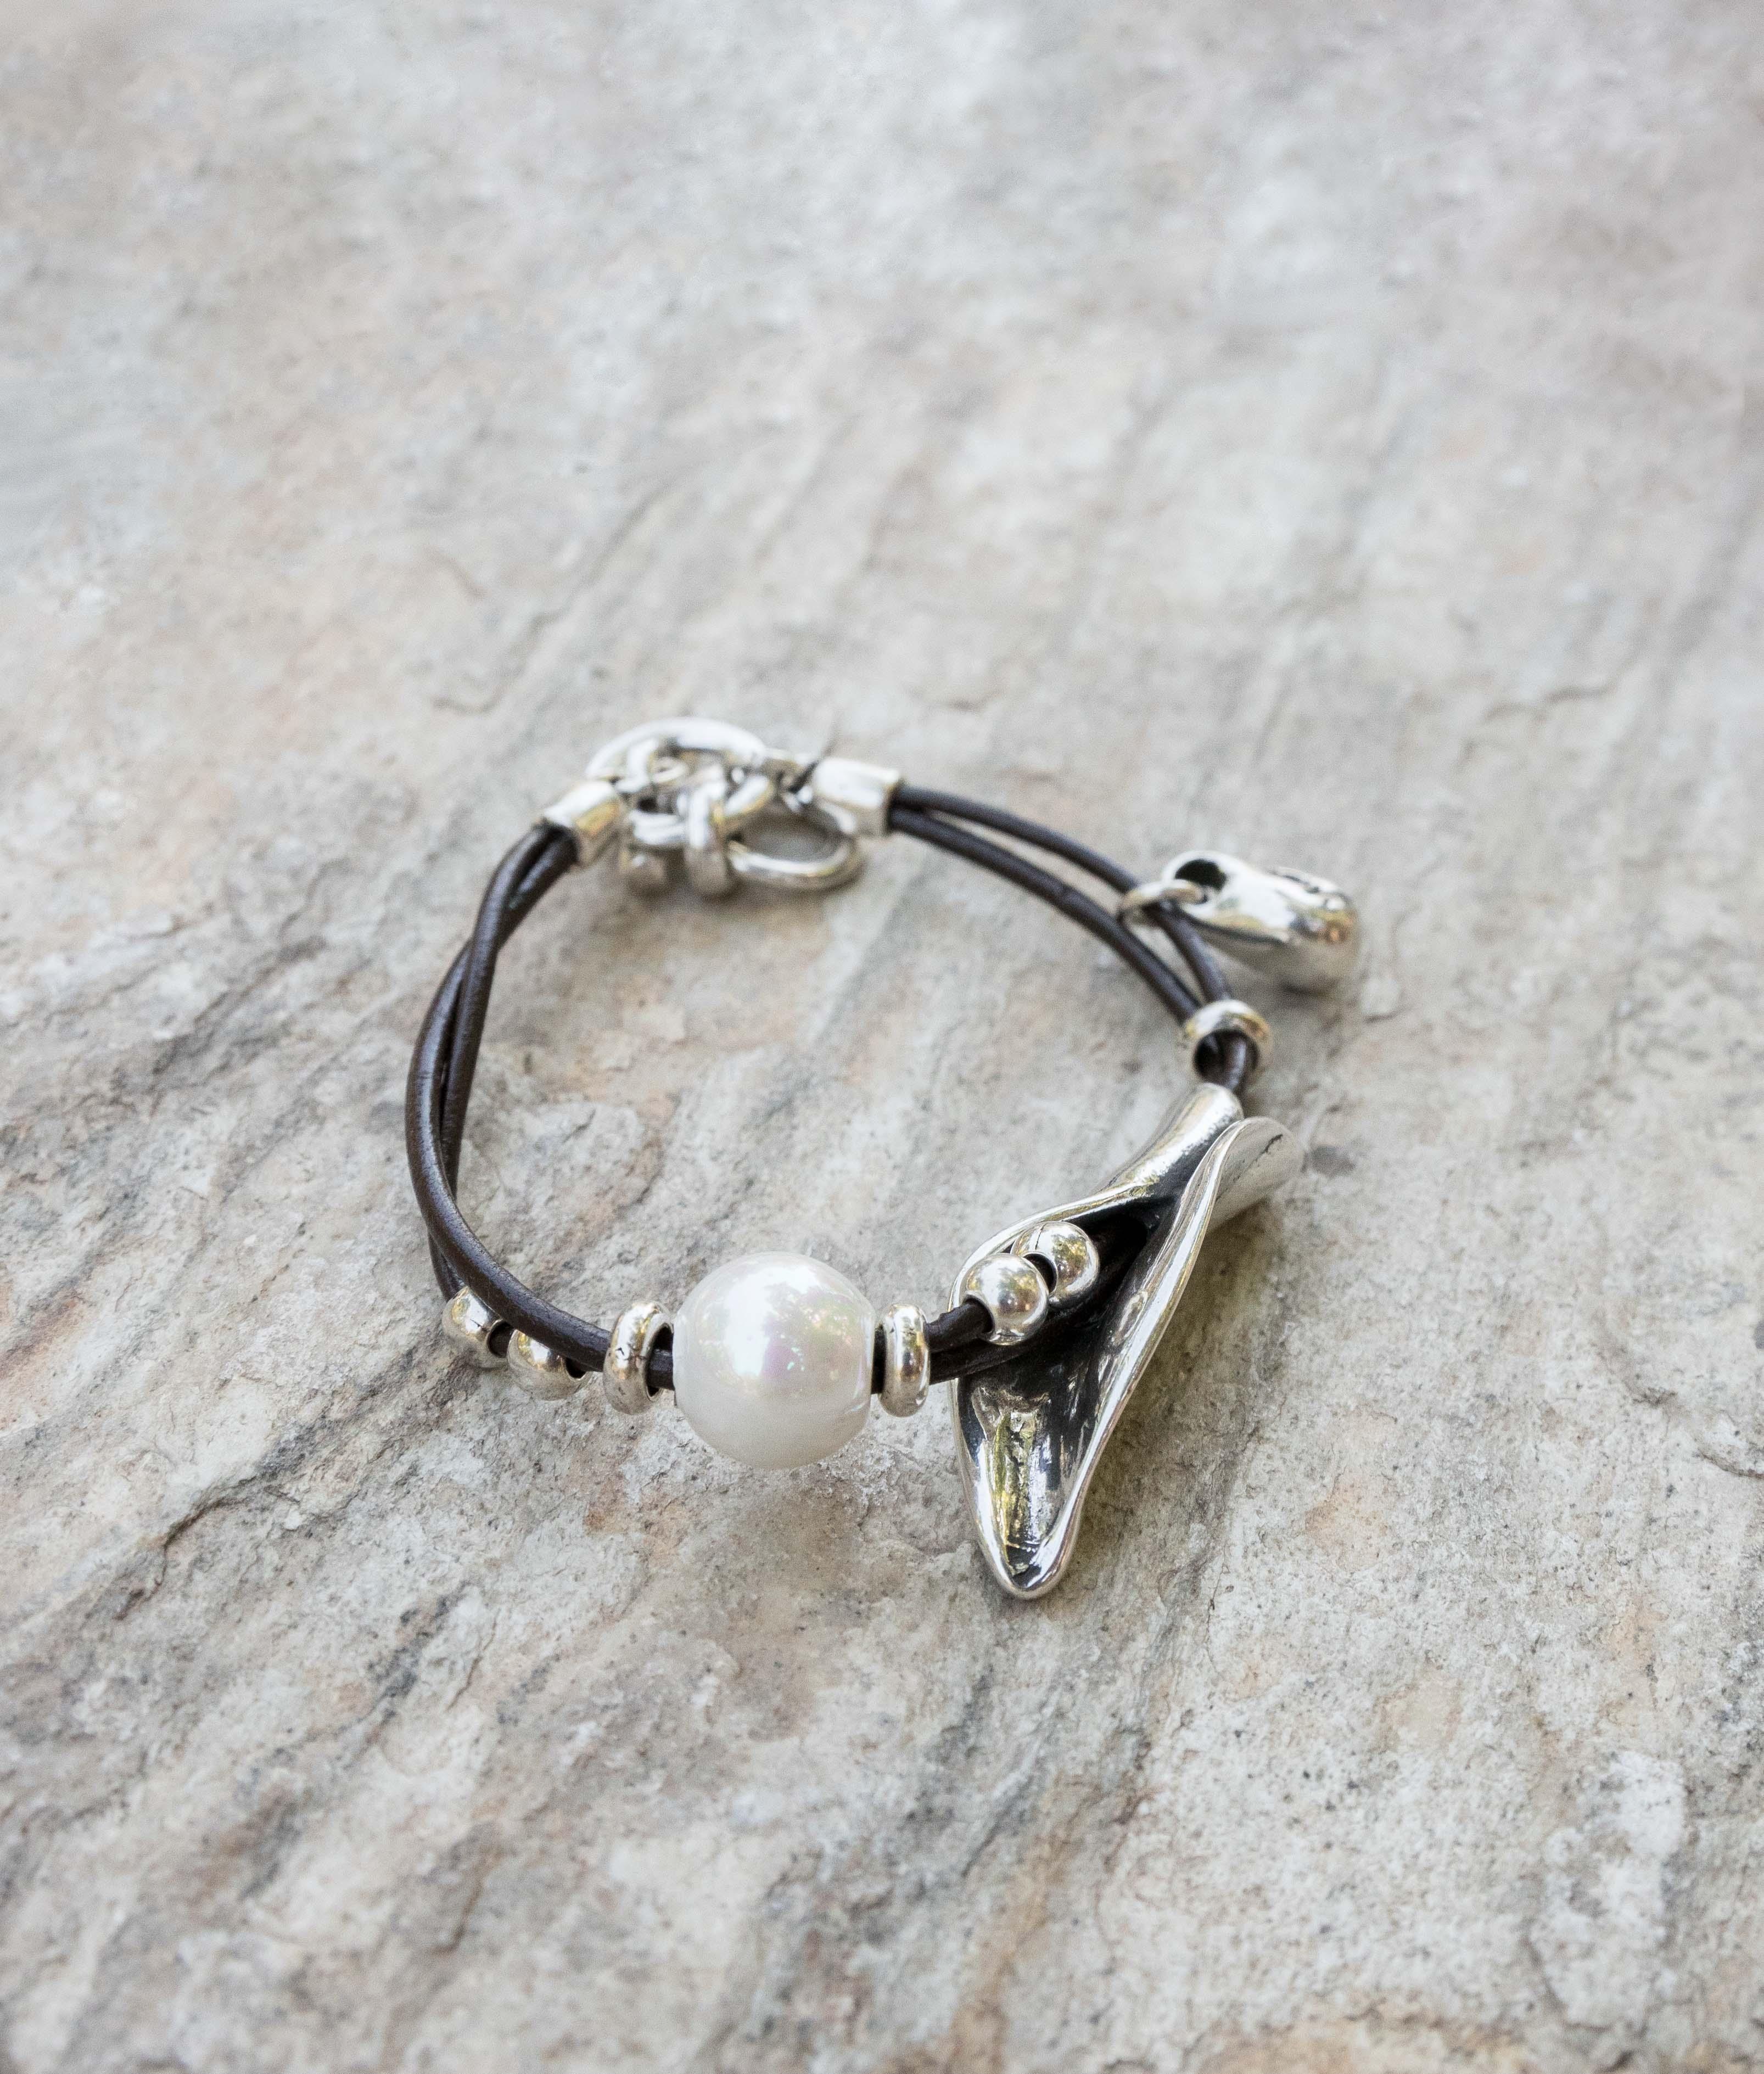 Braccialetto Peta-lo Perla - Argento